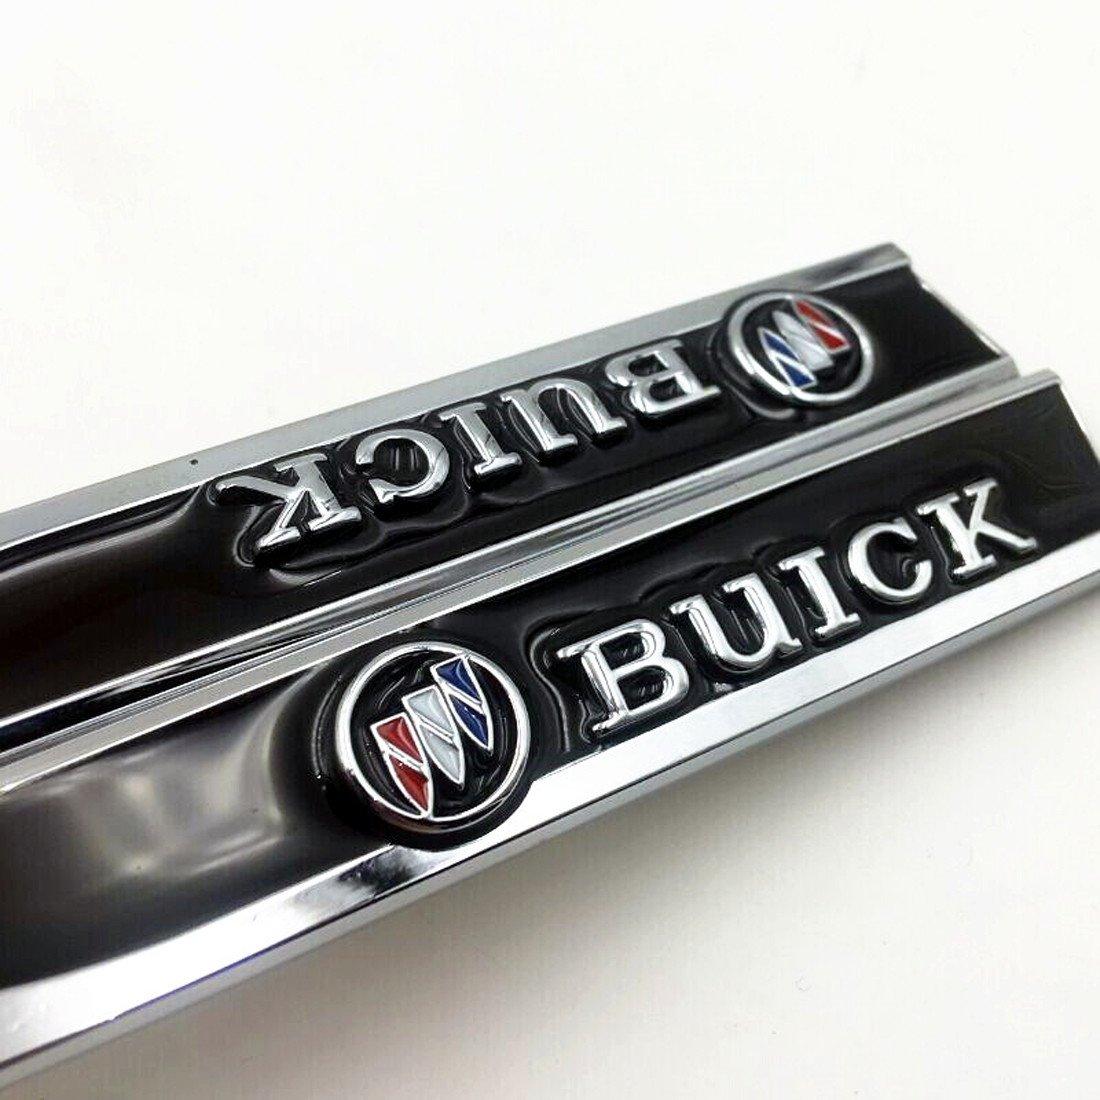 Amazon Deselen Ebs Bt09 Buick Emblem Chrome Motion Blade Side